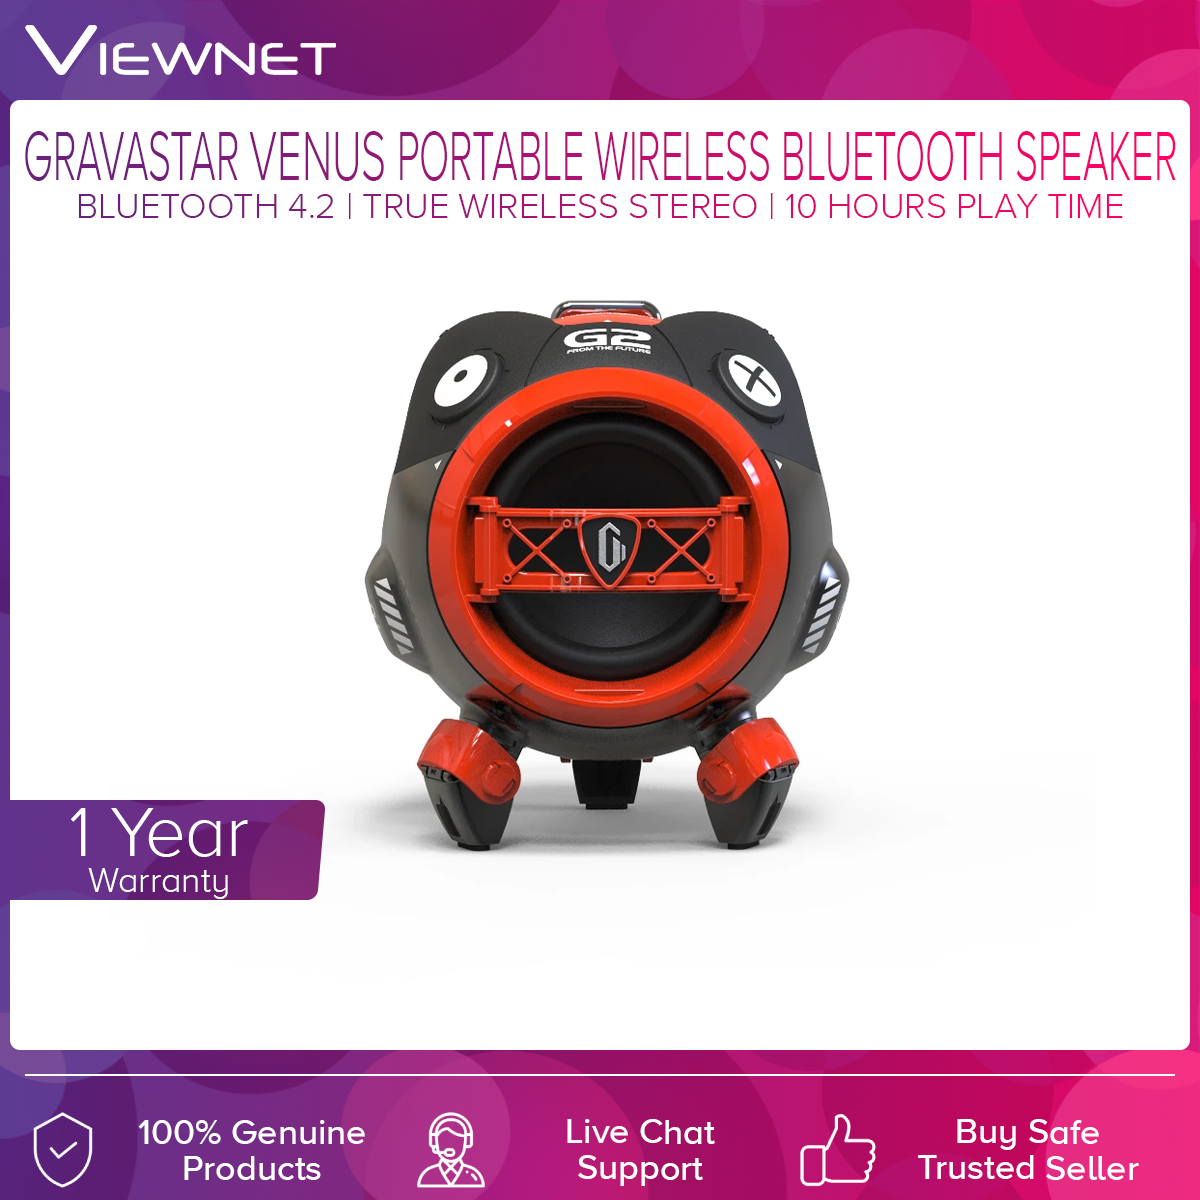 GravaStar Venus Wireless Bluetooth 4.2 Speaker, 10 Hours Play Time, 6 RGB Lights, Full-range subwoofer Drivers